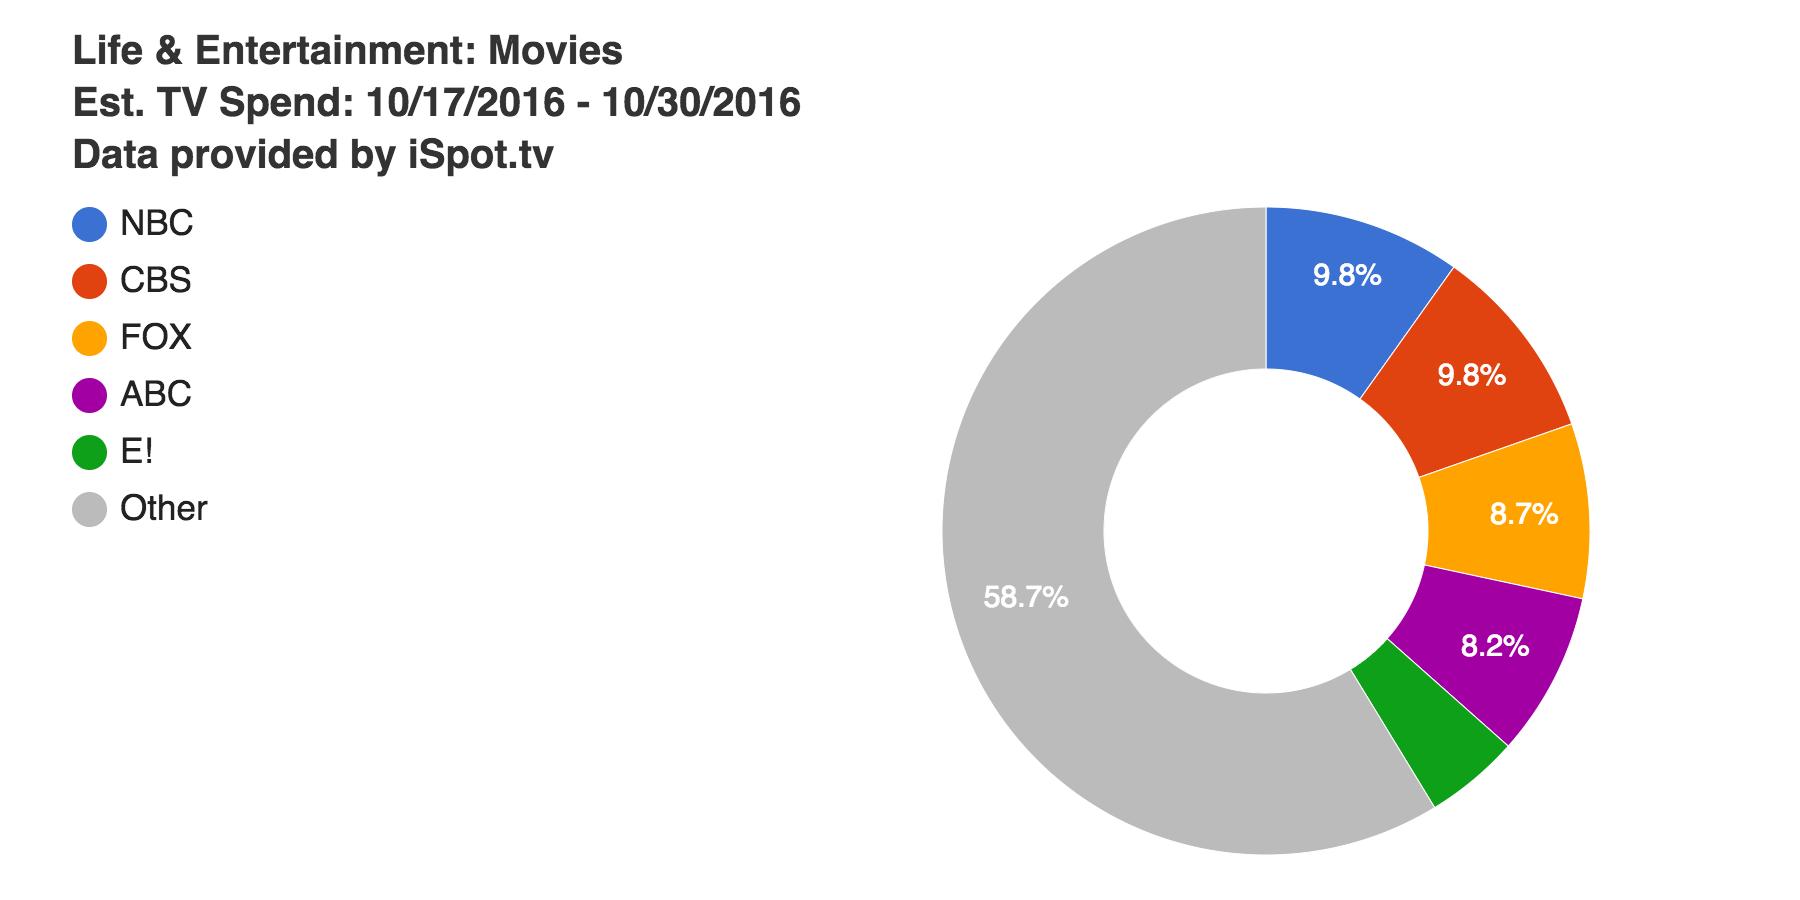 life entertainment movies est tv spend 10 17-2016-10-30-2016-1